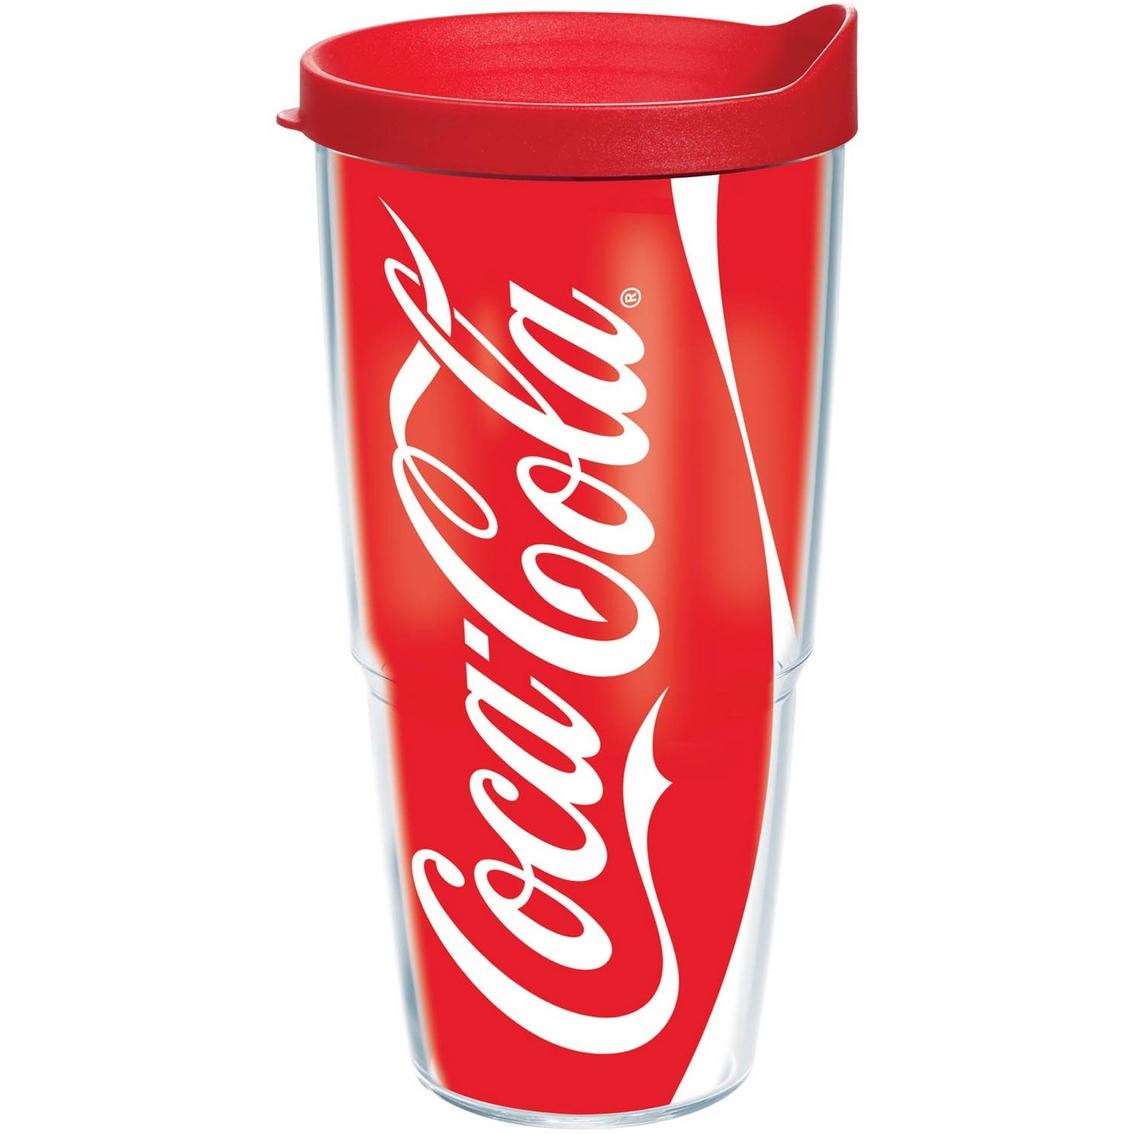 Tervis Tumblers 24 oz. Coca-Cola Coke Can or Diet Coke Wrap Tumbler $9.57